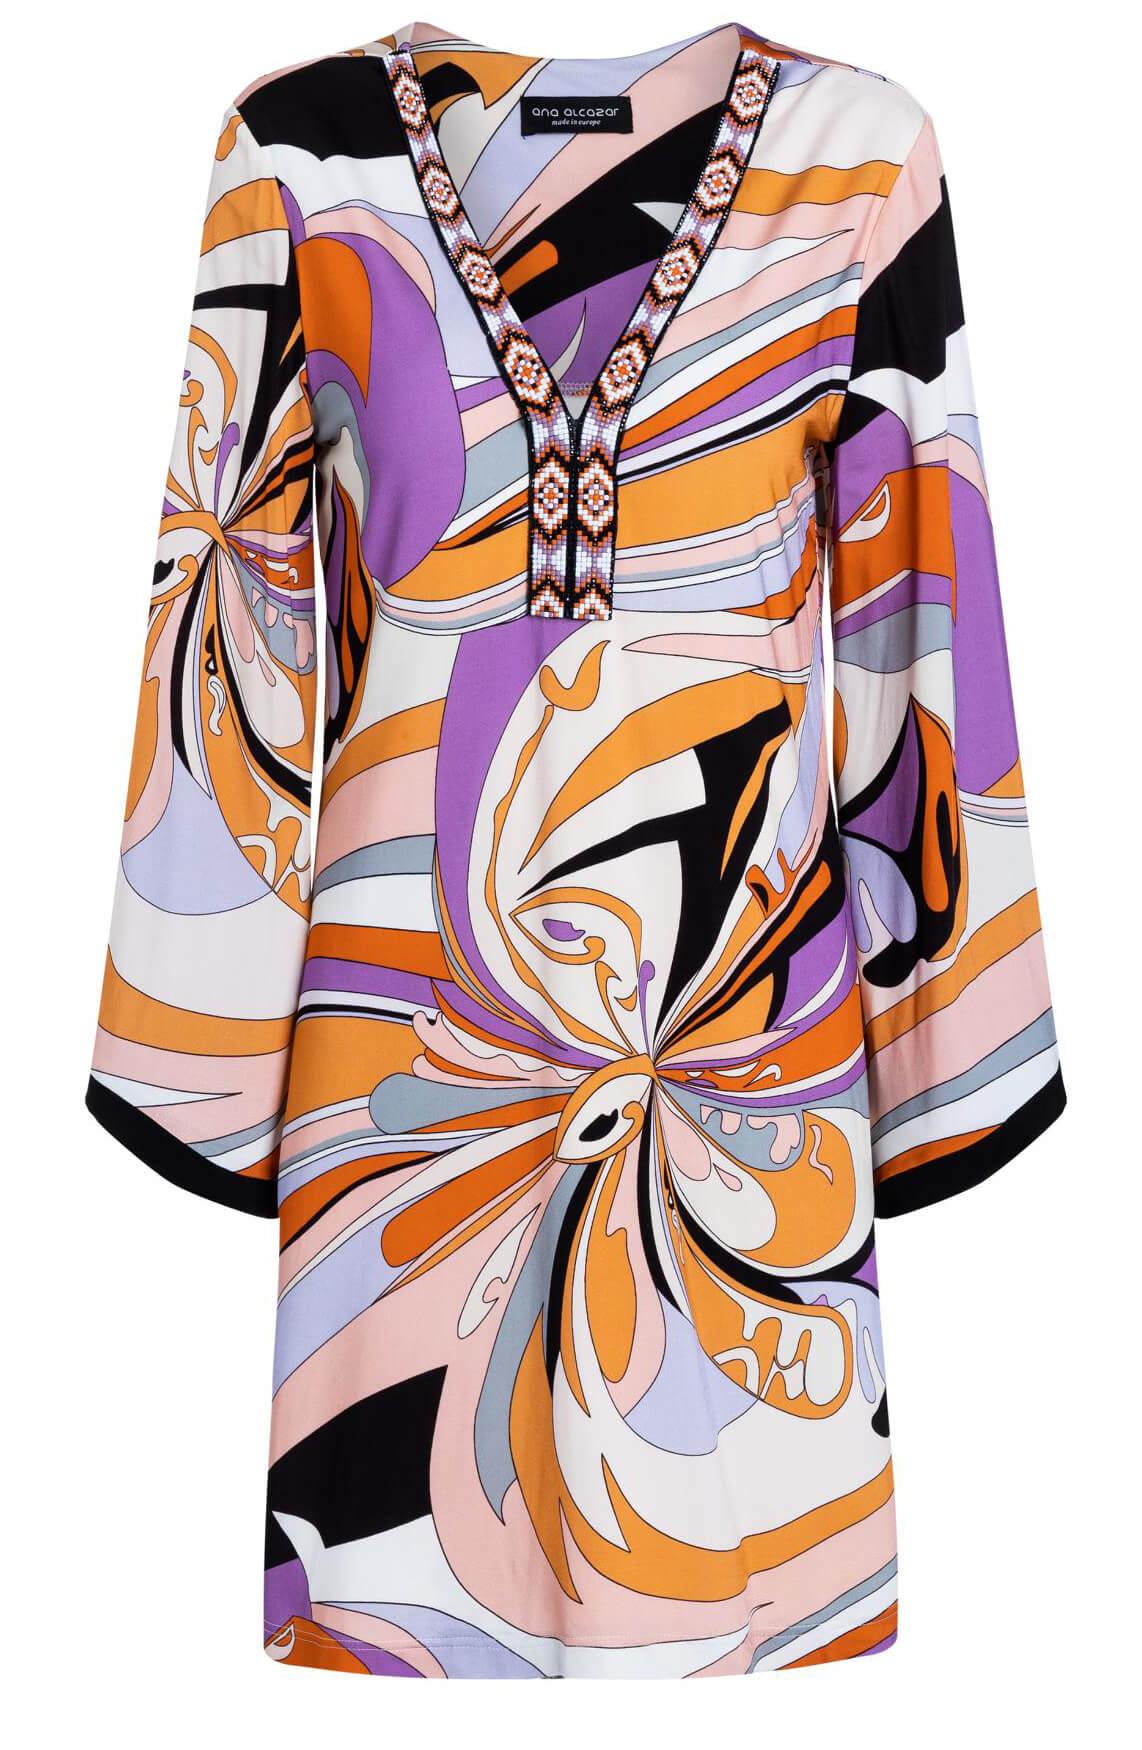 Ana Alcazar Dames Geprinte jurk Oranje